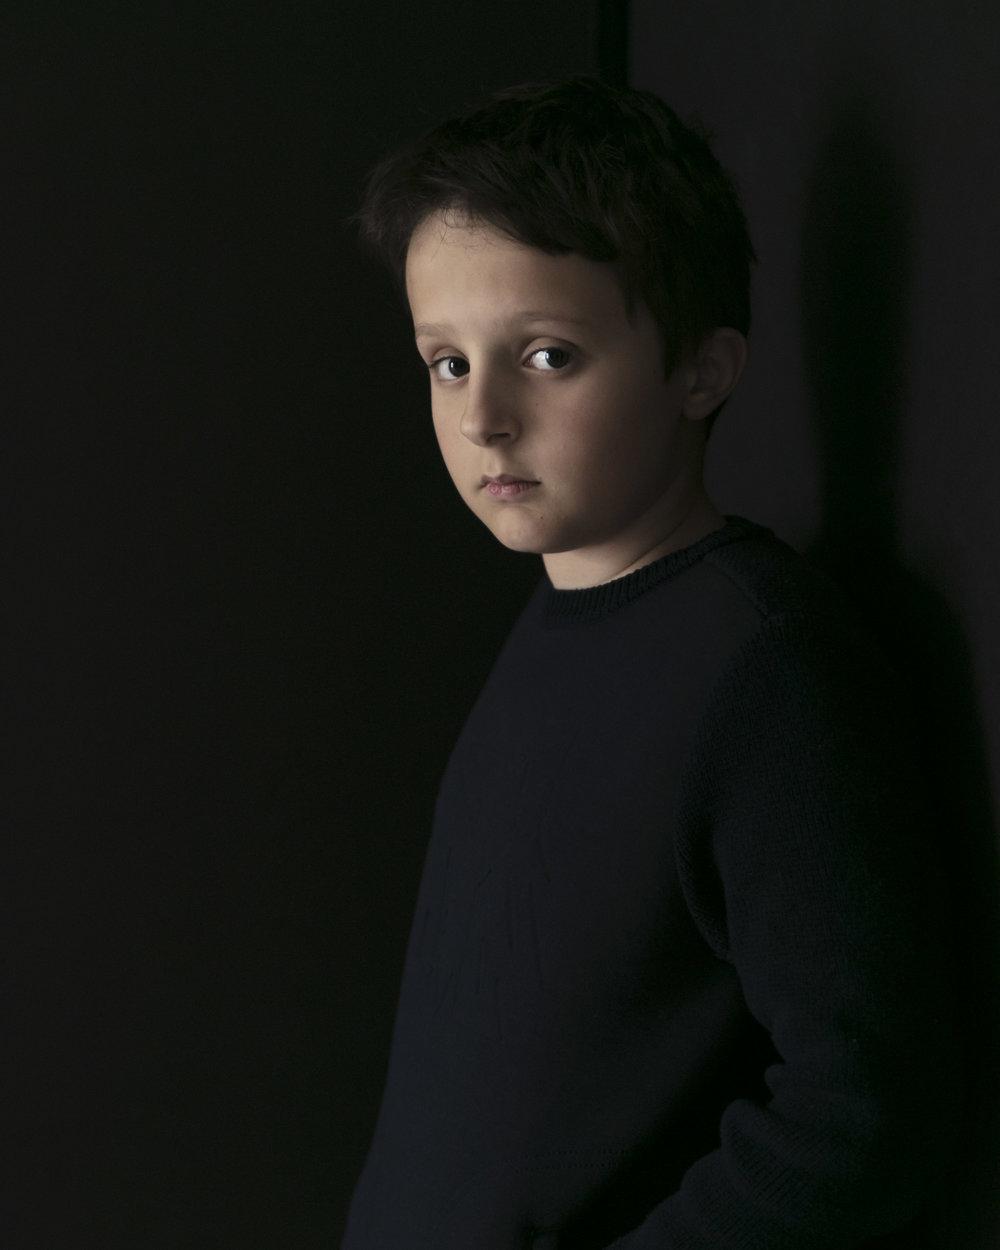 marina-mcdonald-child-portrait-photography-portfolio-canberra-child-boy-classic